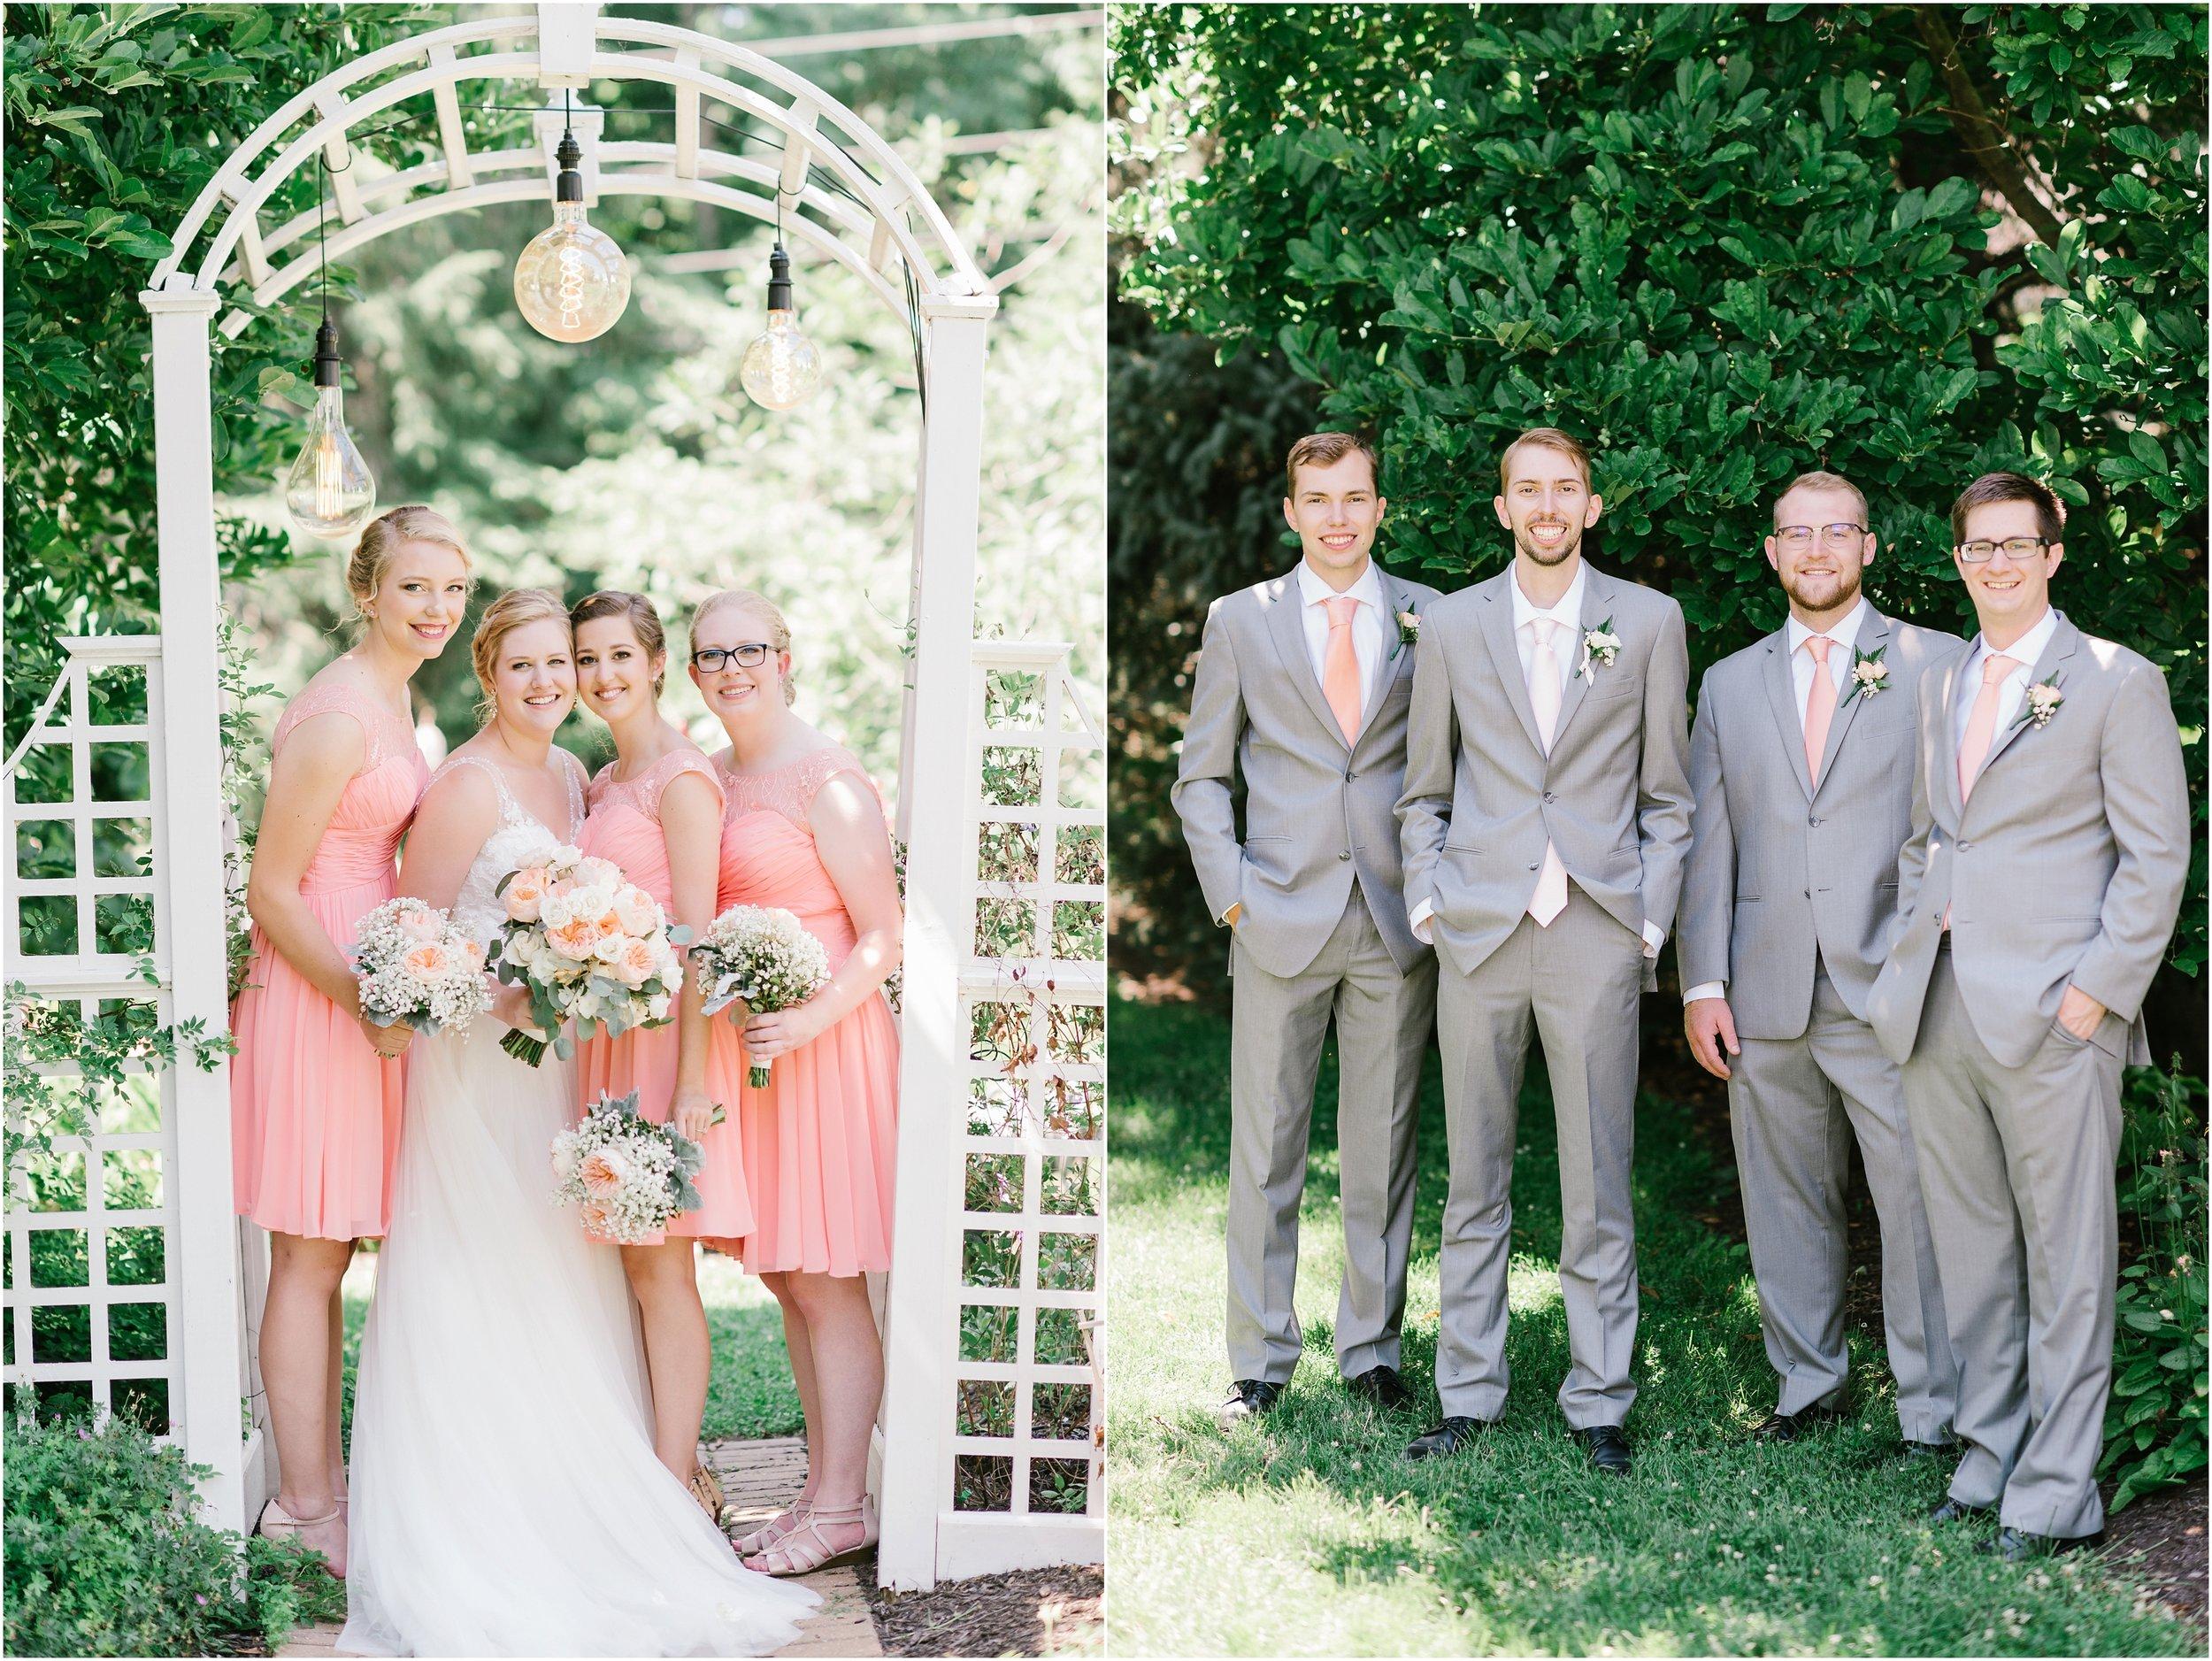 Rebecca_Shehorn_Photography_Indianapolis_Wedding_Photographer_8489.jpg